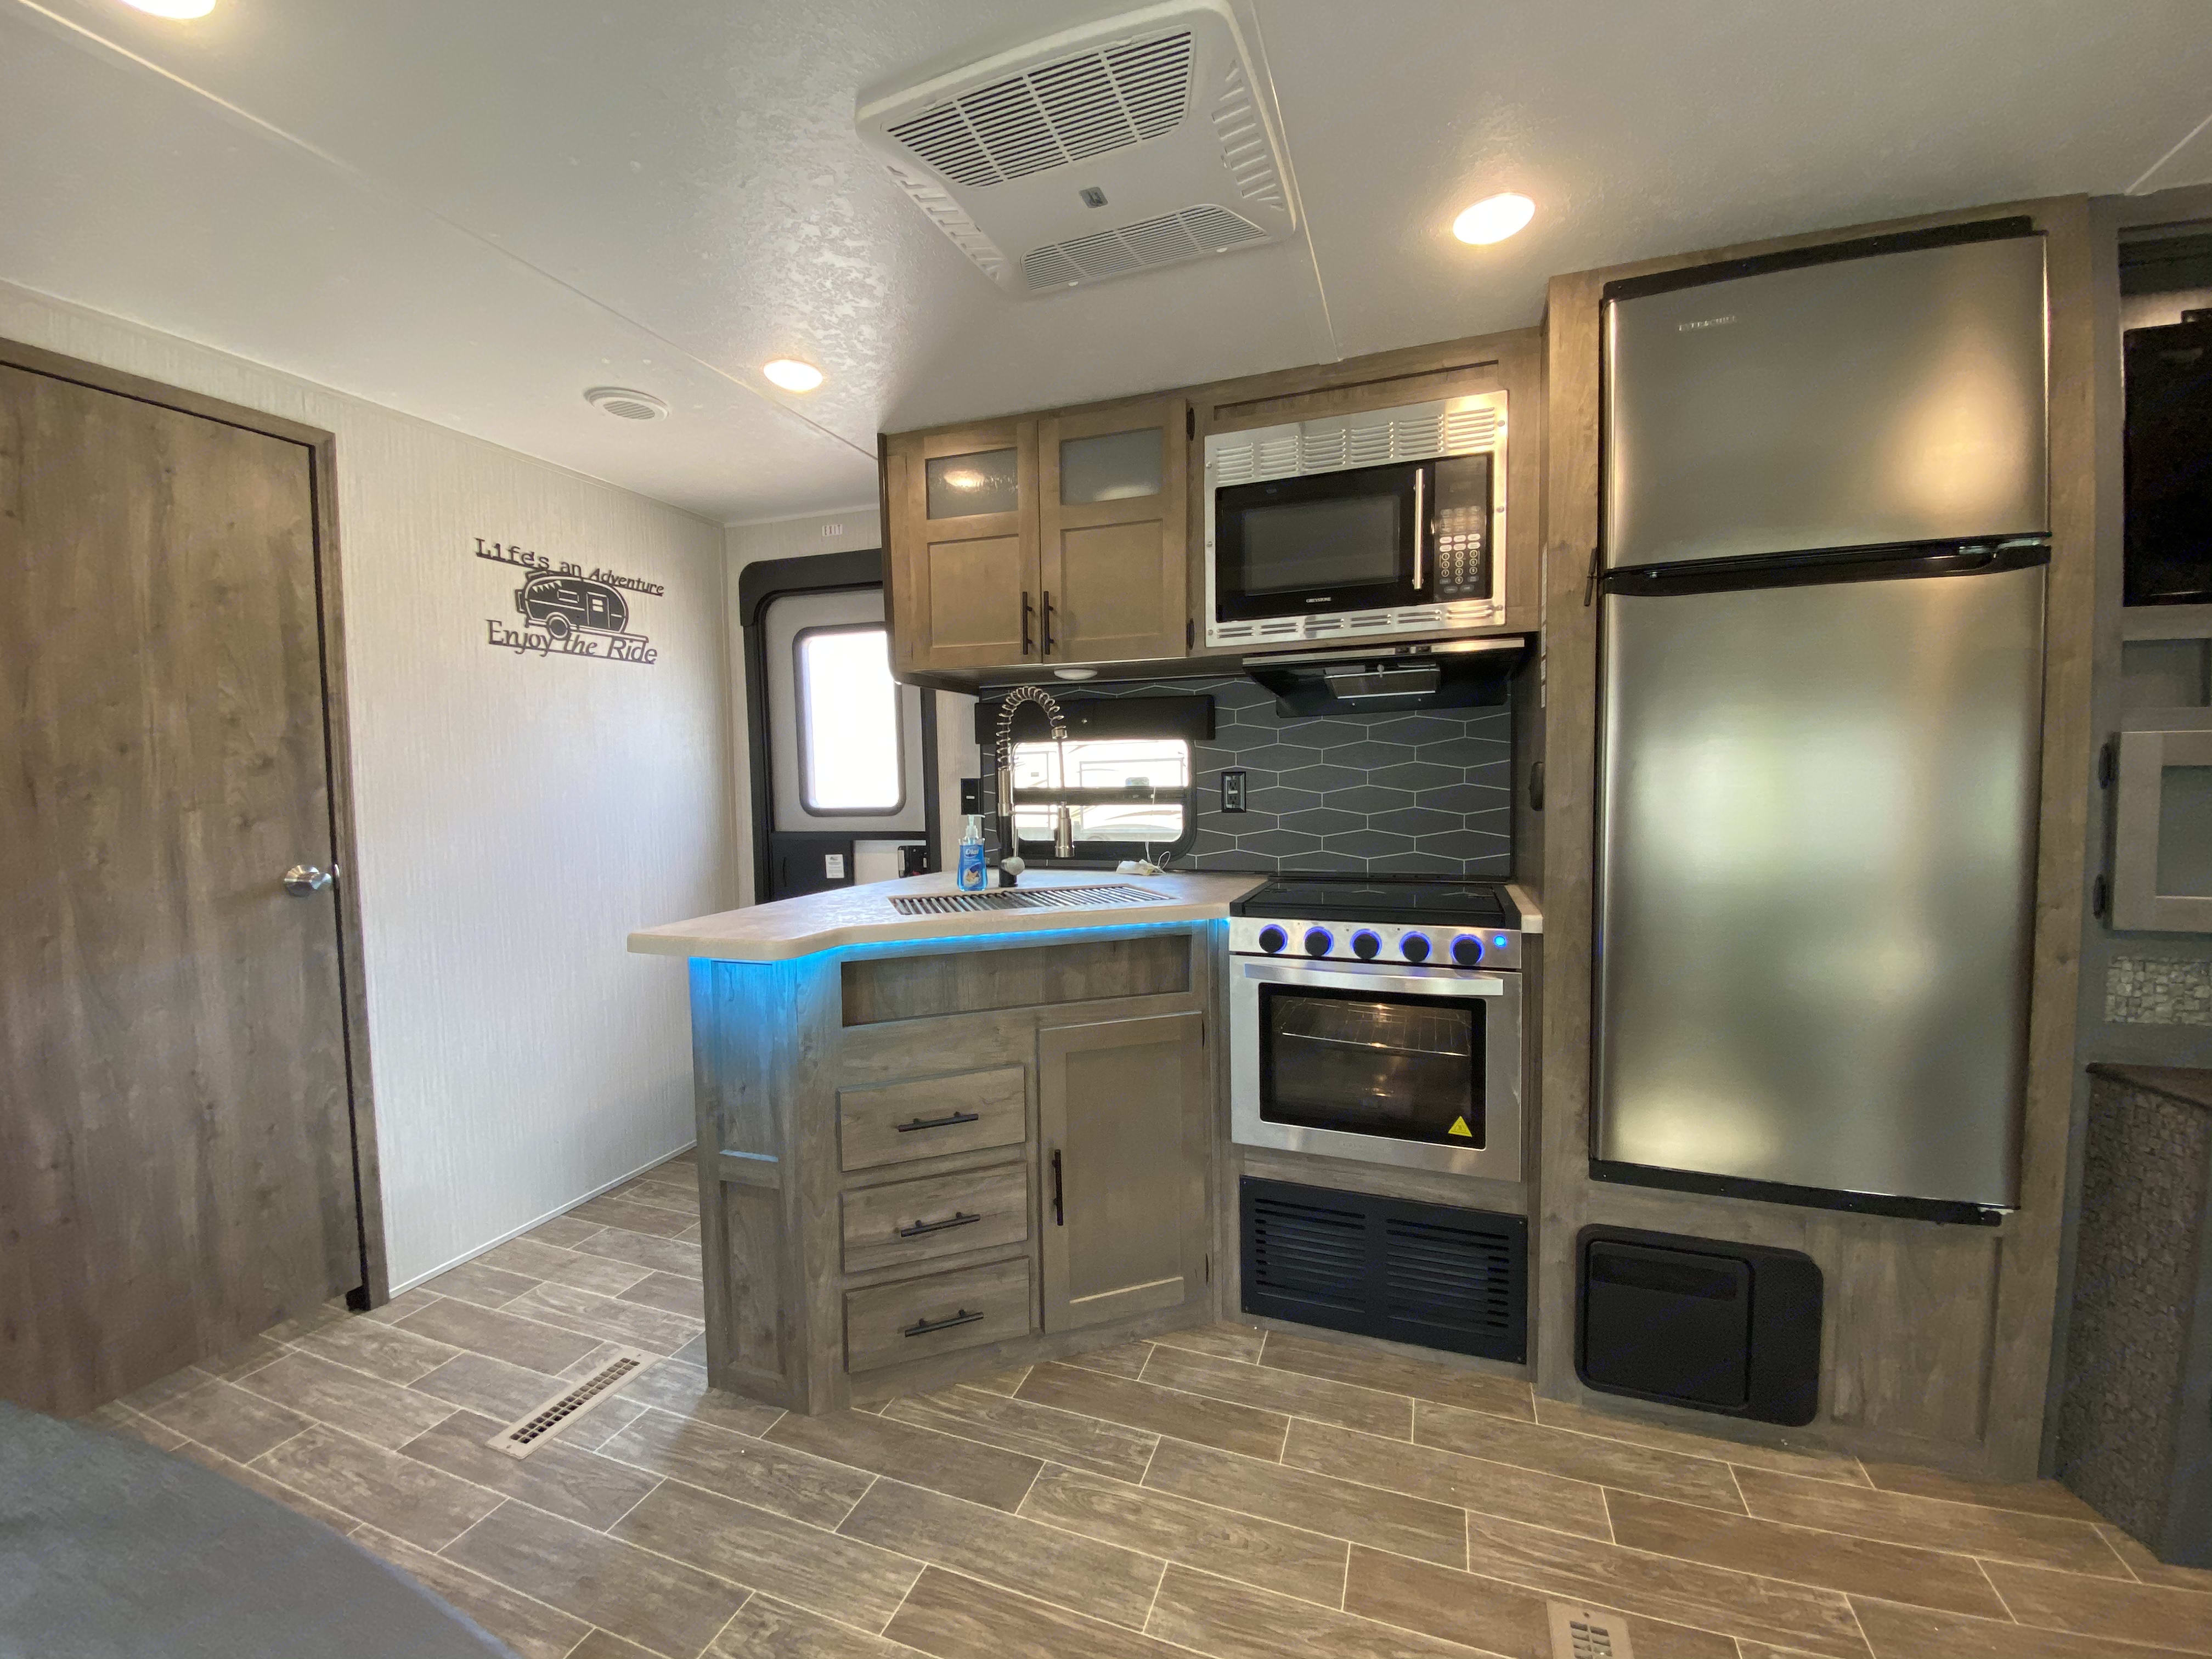 Full kitchen. Palomino Puma 2020